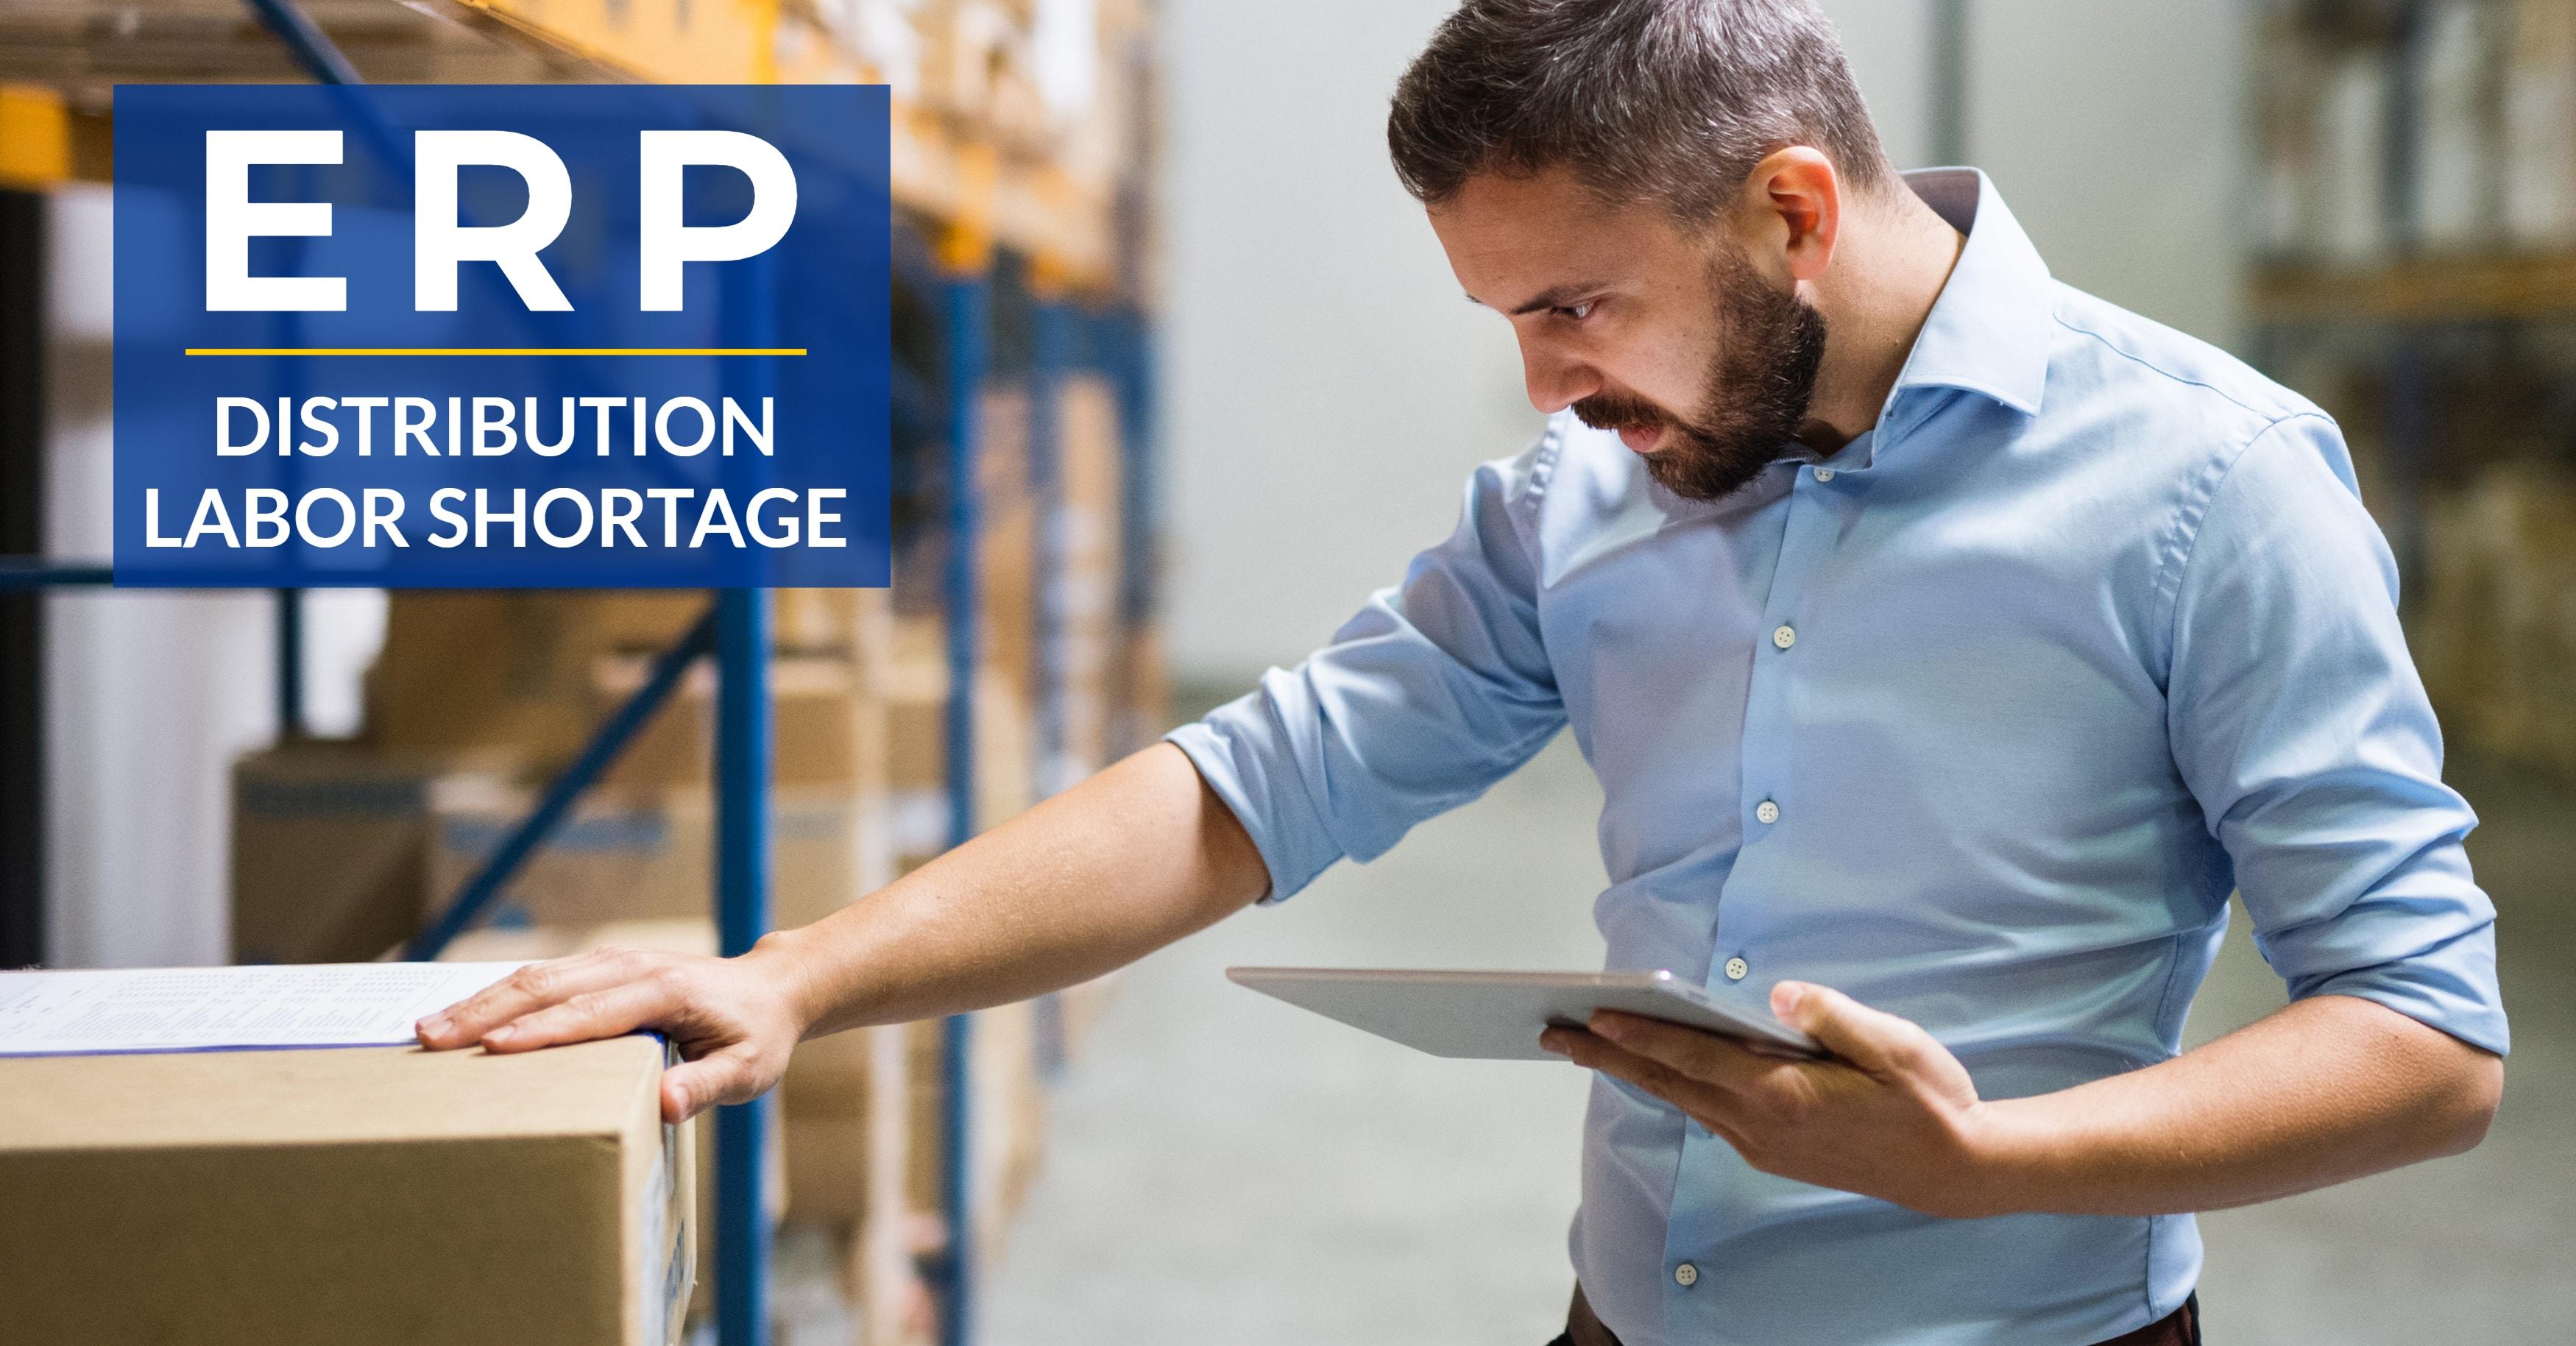 ERP Distribution Labor Shortage